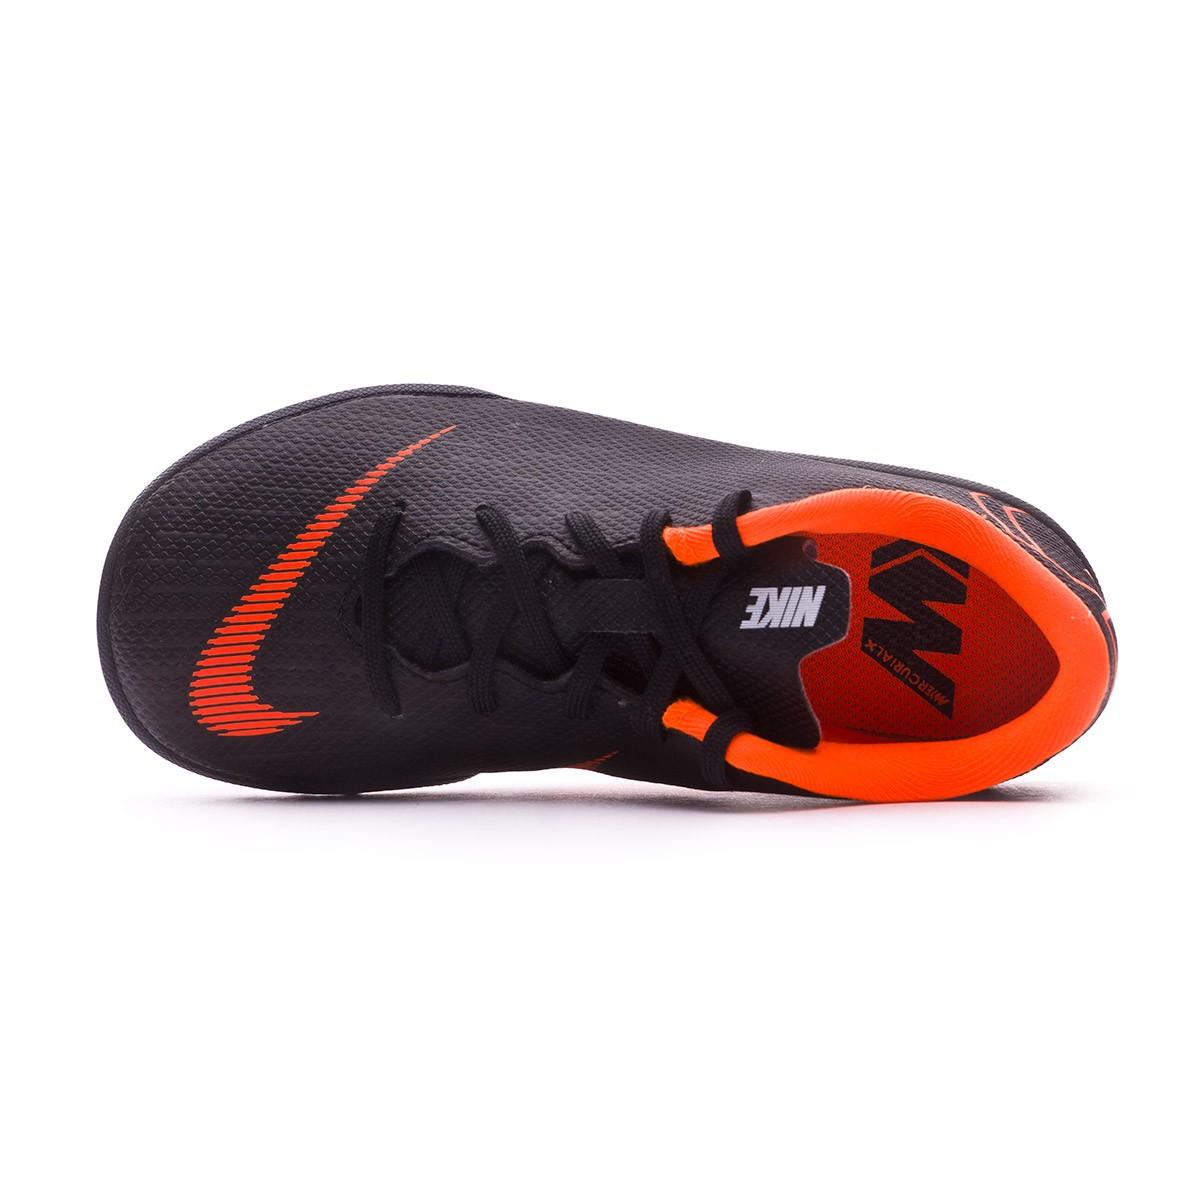 1e89e61b613a Football Boot Nike Kids Mercurial VaporX XII Academy PS Turf Black-Total  orange-White - Football store Fútbol Emotion